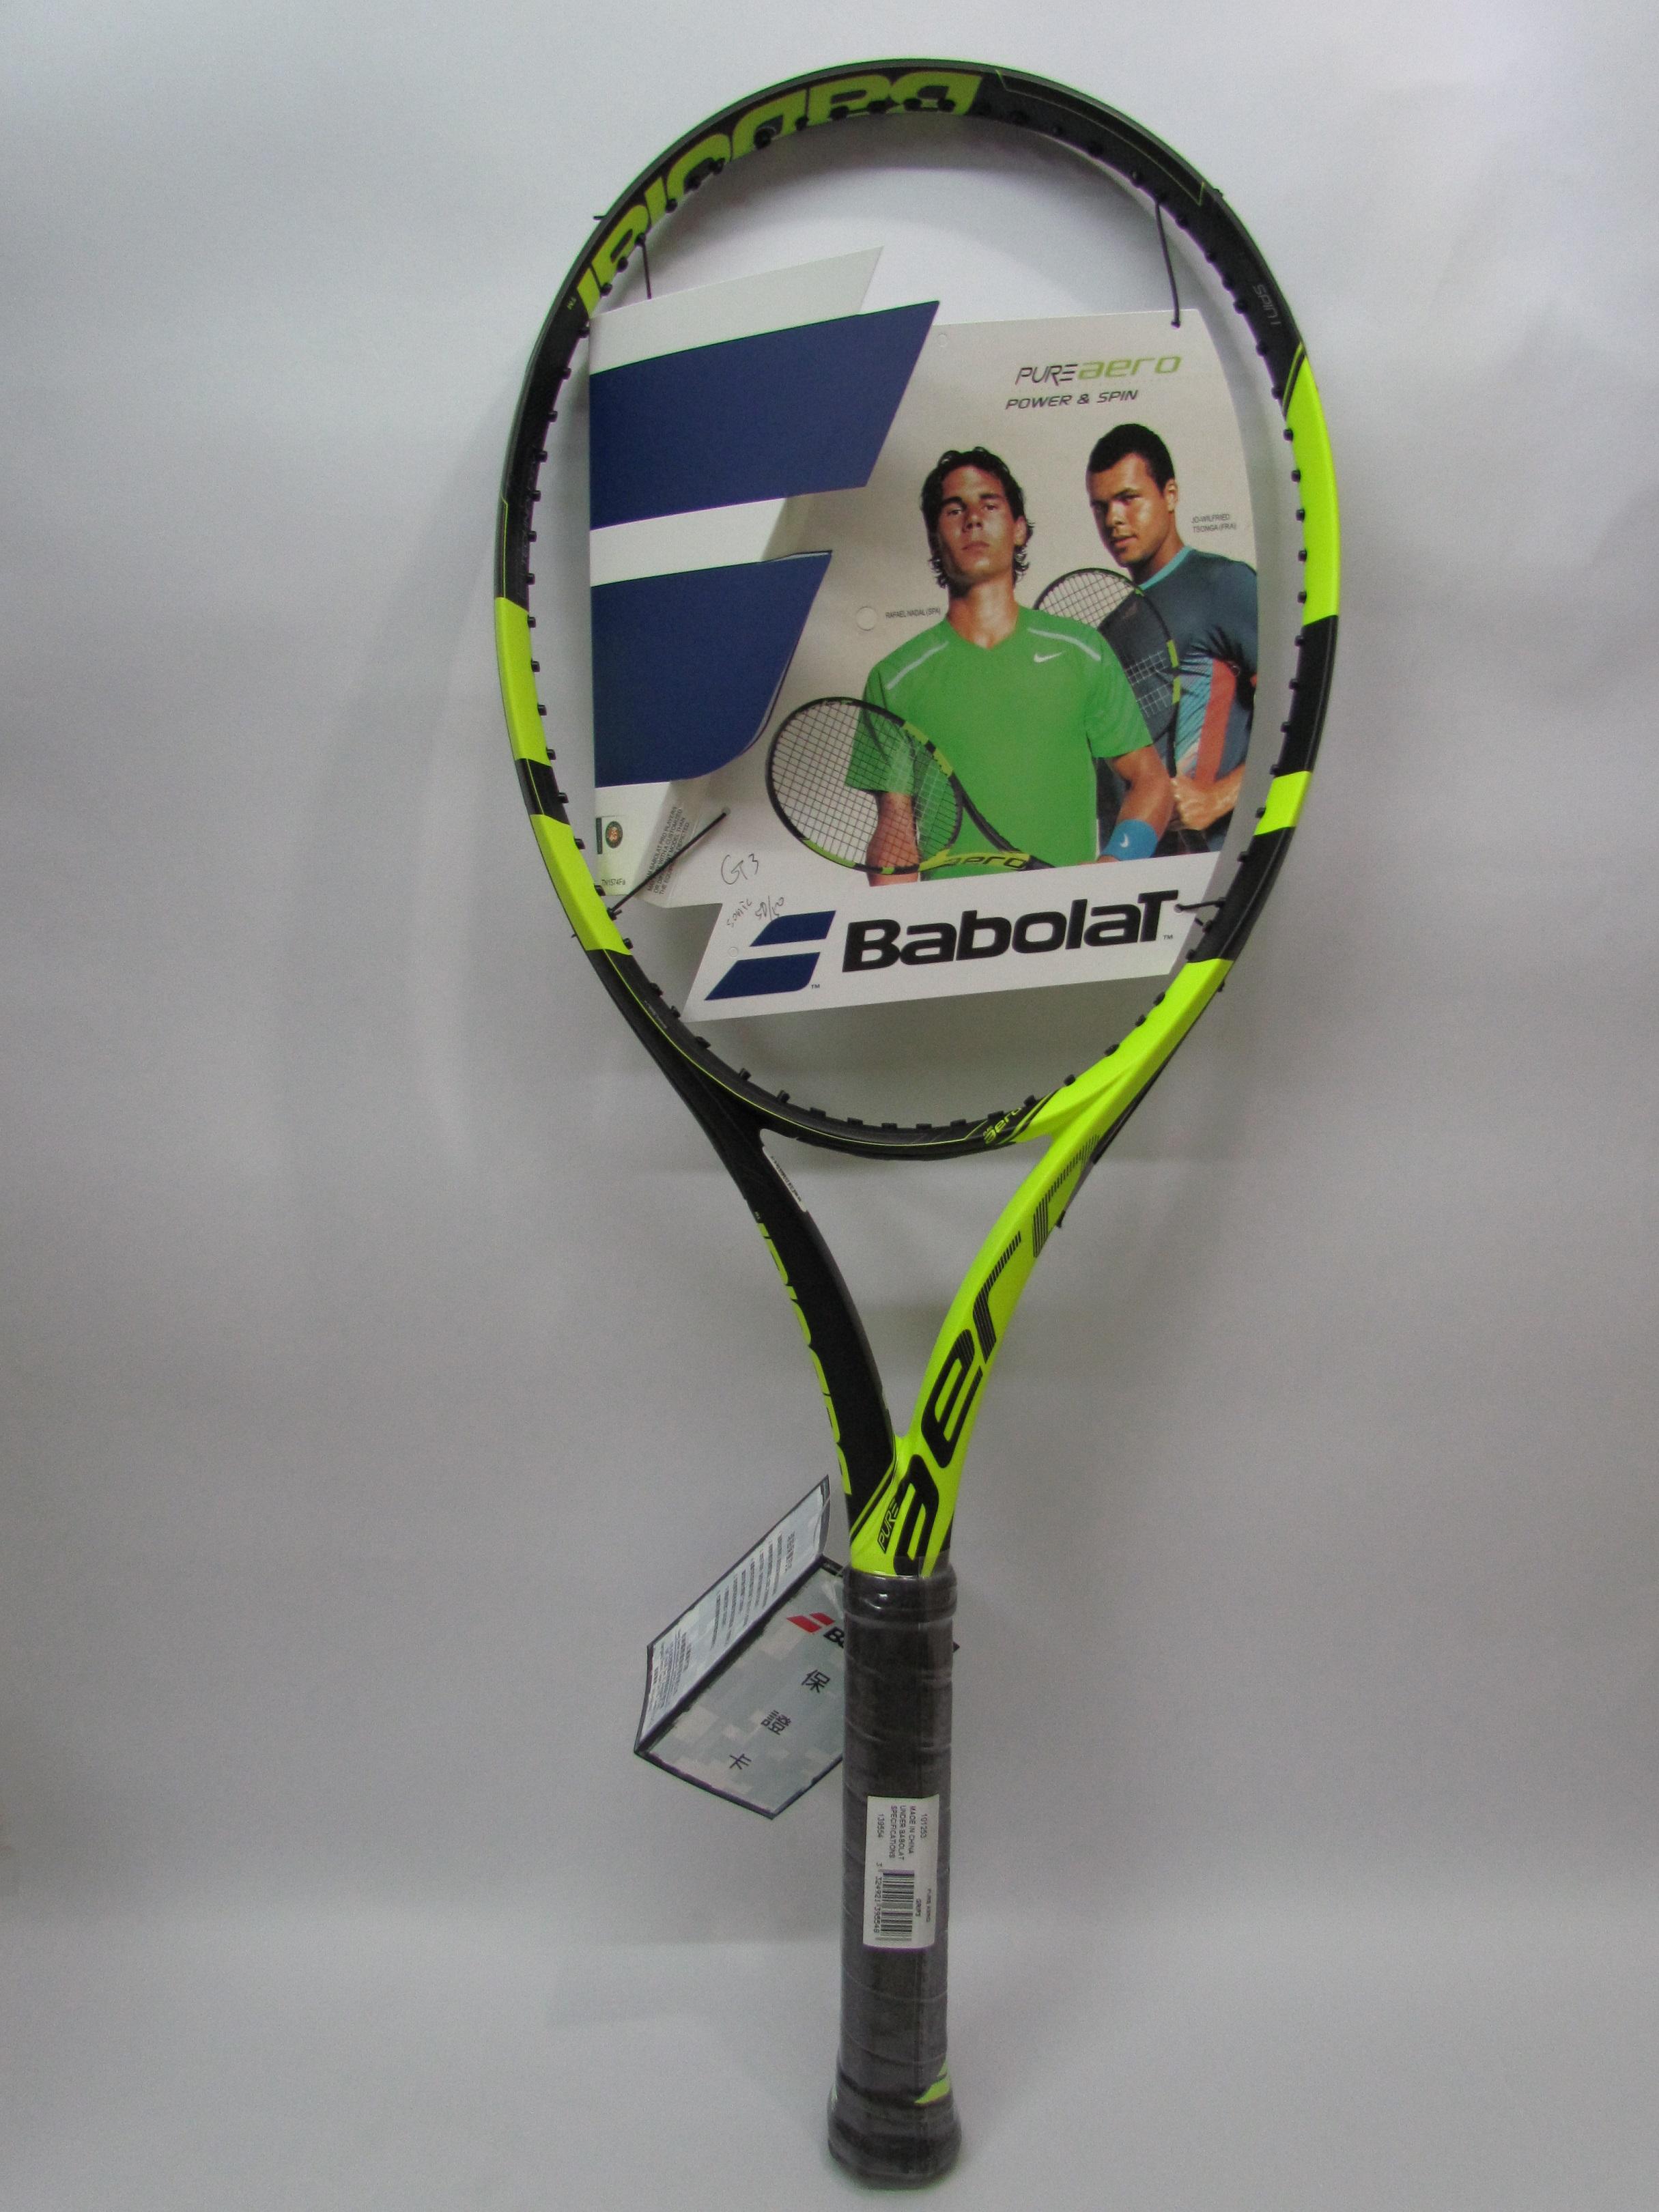 Babolat專業網球拍 Nadal款 Pure Aero 2016年款